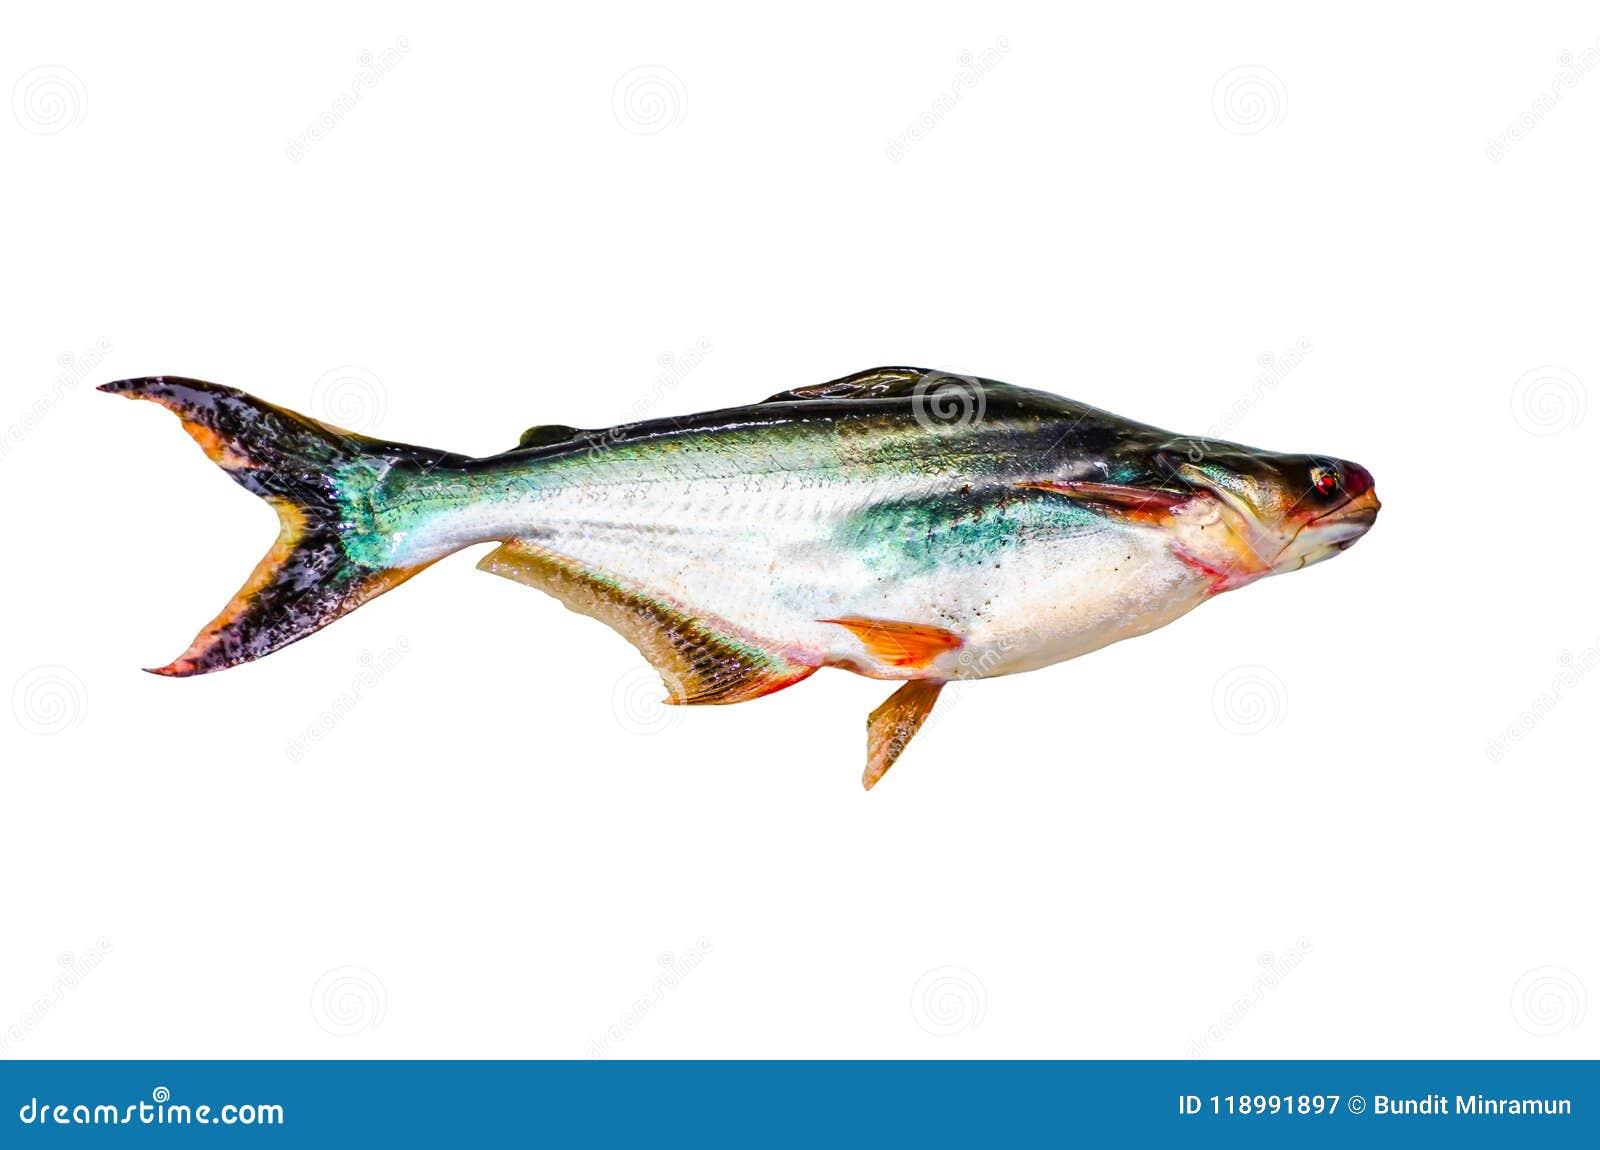 Iridescent shark fish isolated on white background.